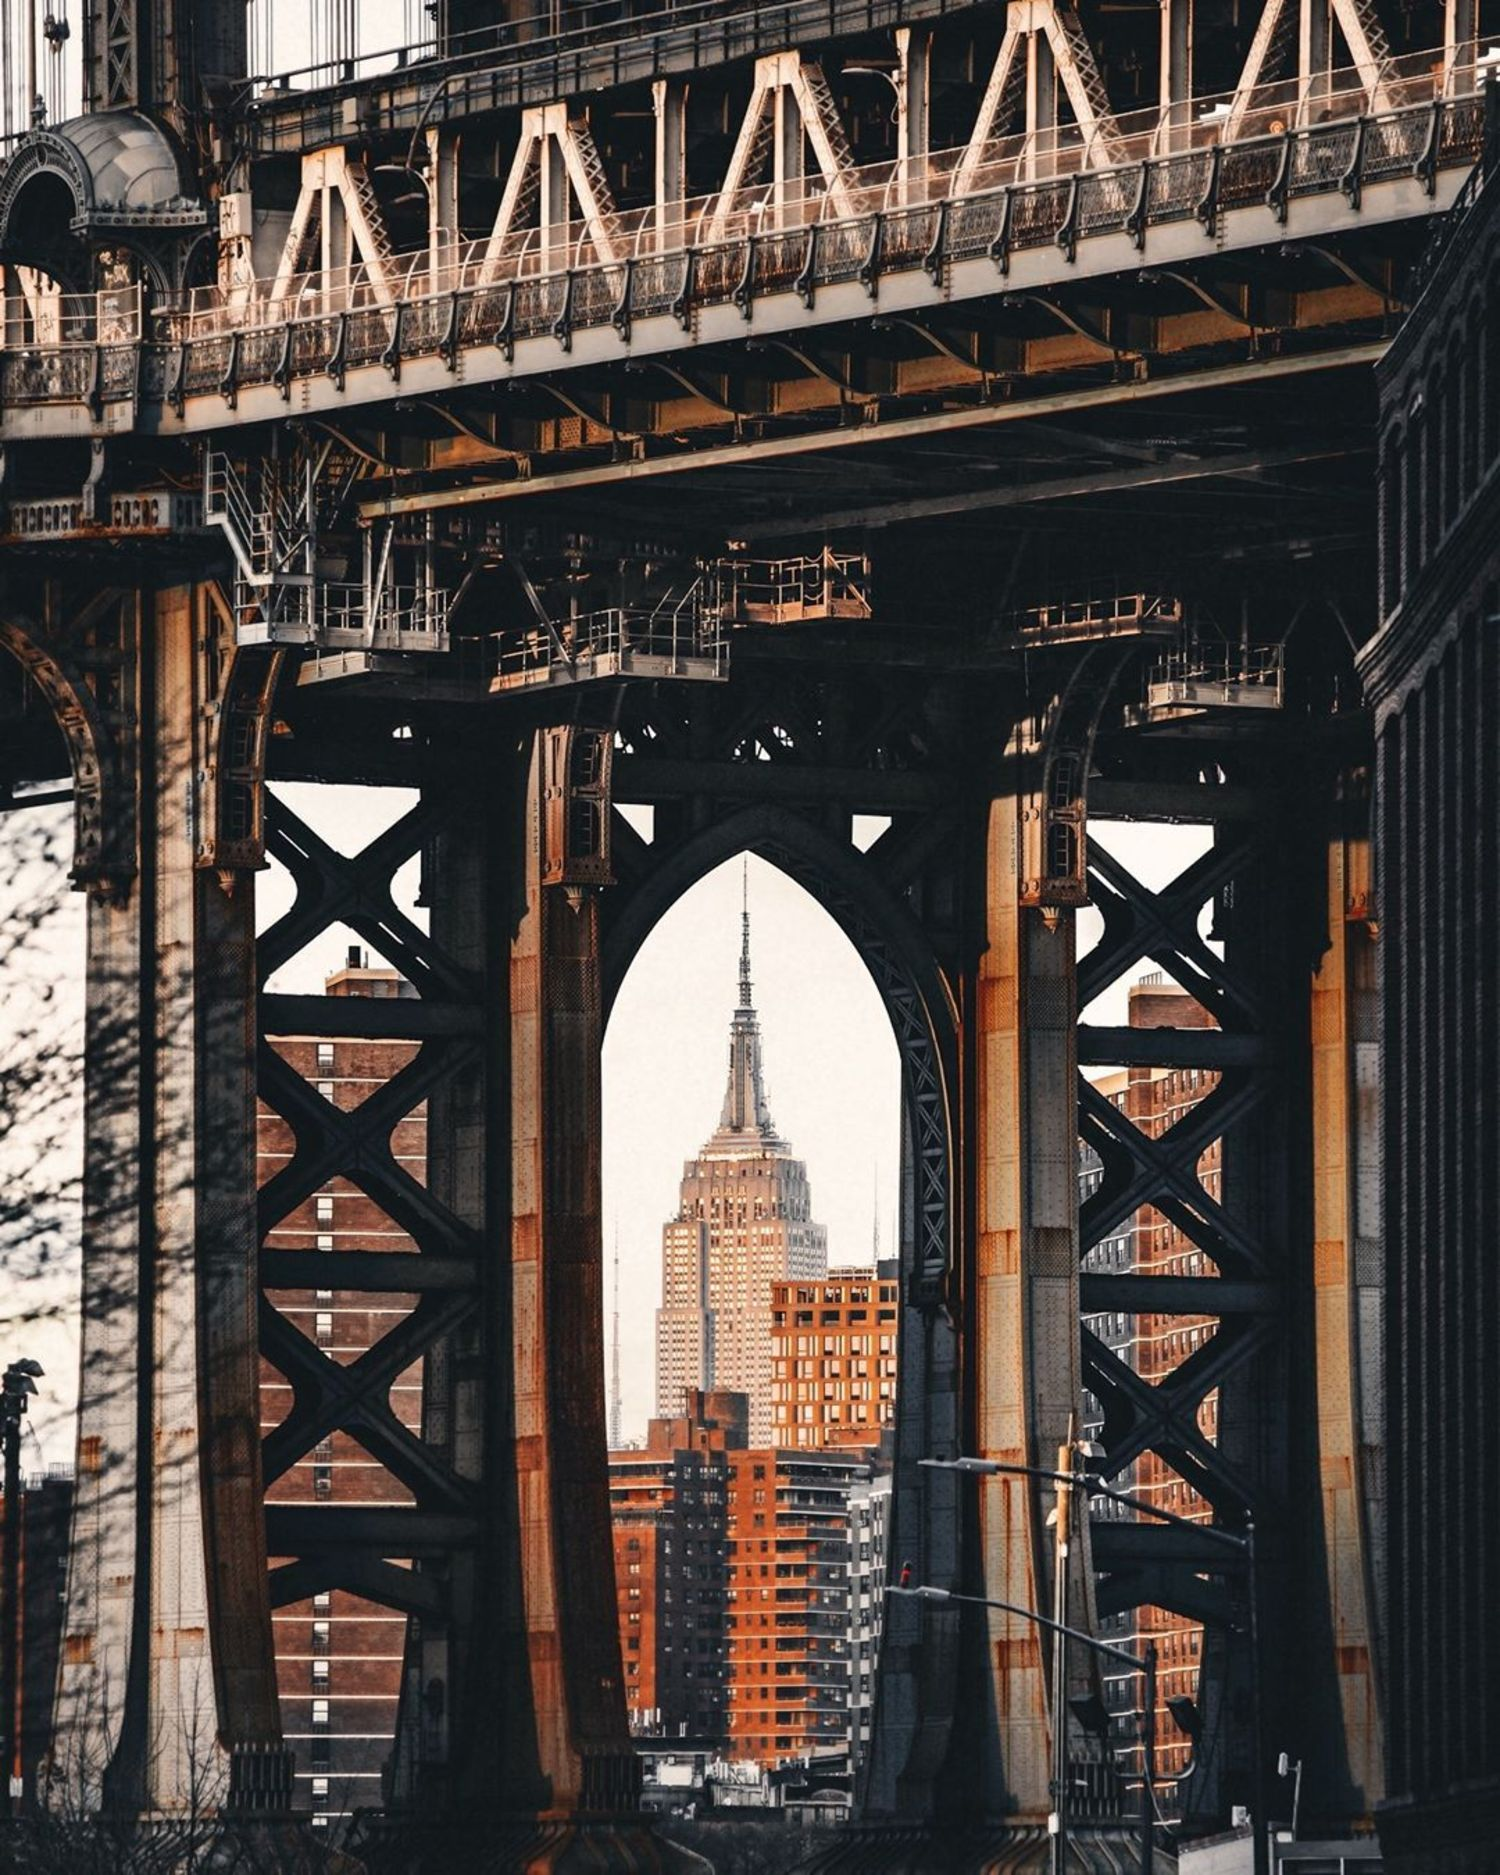 Empire State Building seen through Manhattan Bridge from DUMBO, Brooklyn